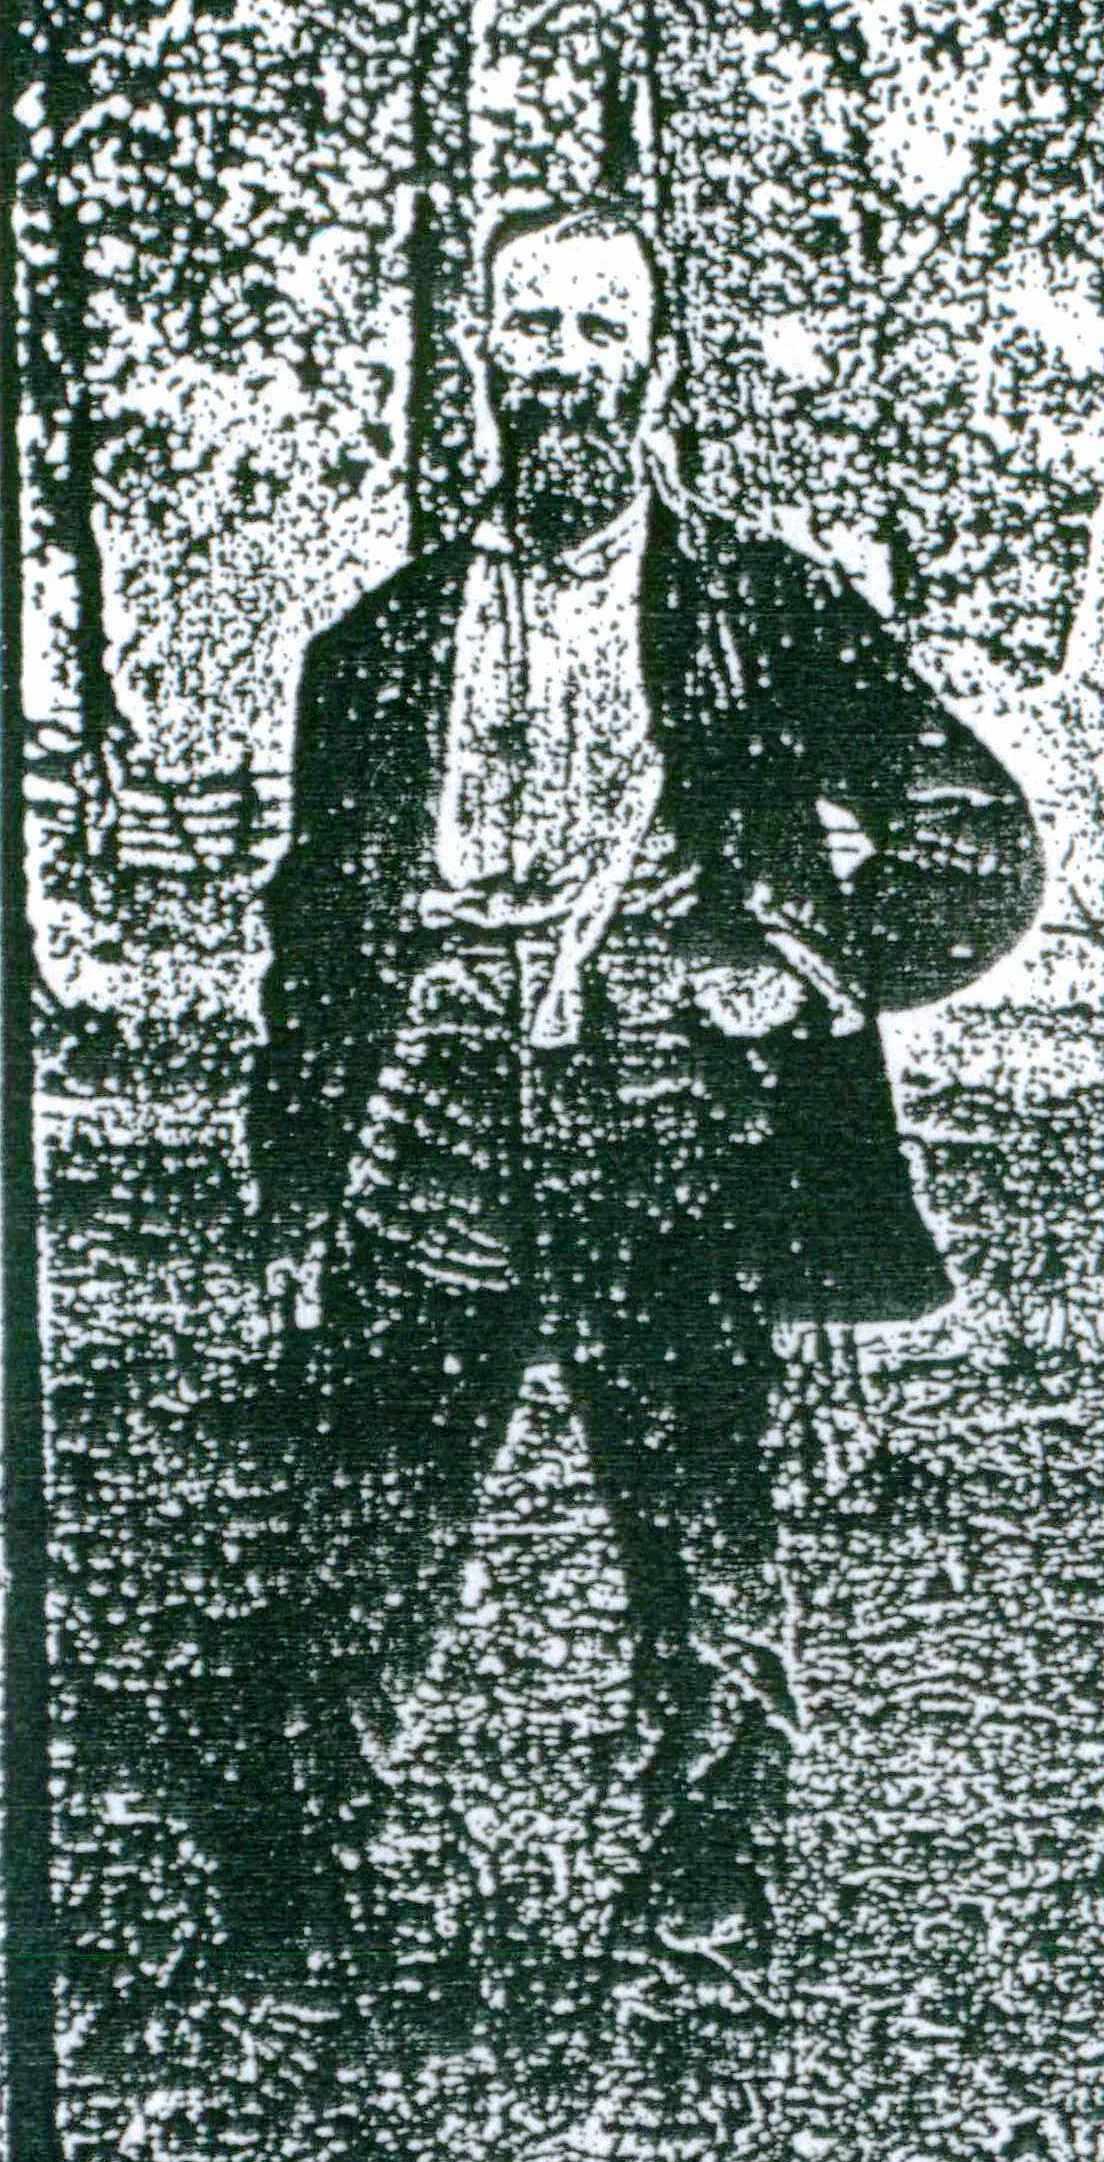 James Henry Jackson